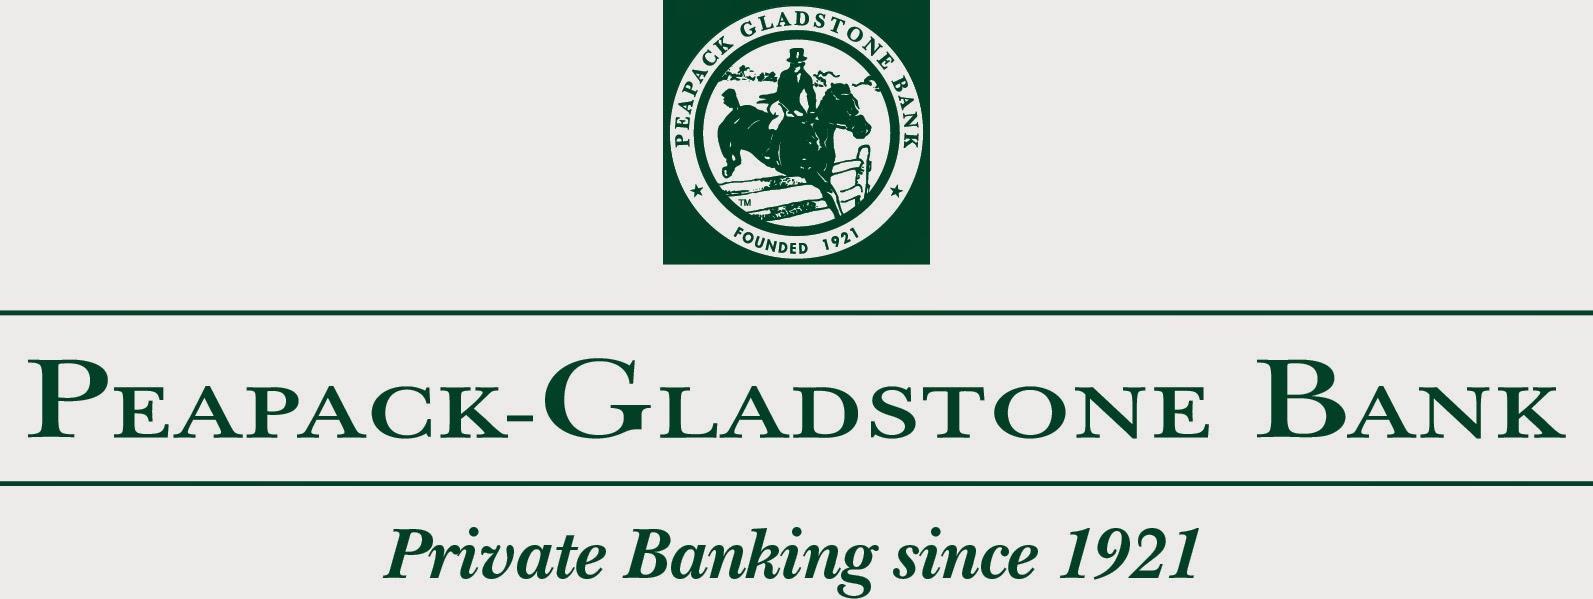 Peapack-Gladstone-Bank-Center-LOGO-10-8-14-1.jpg